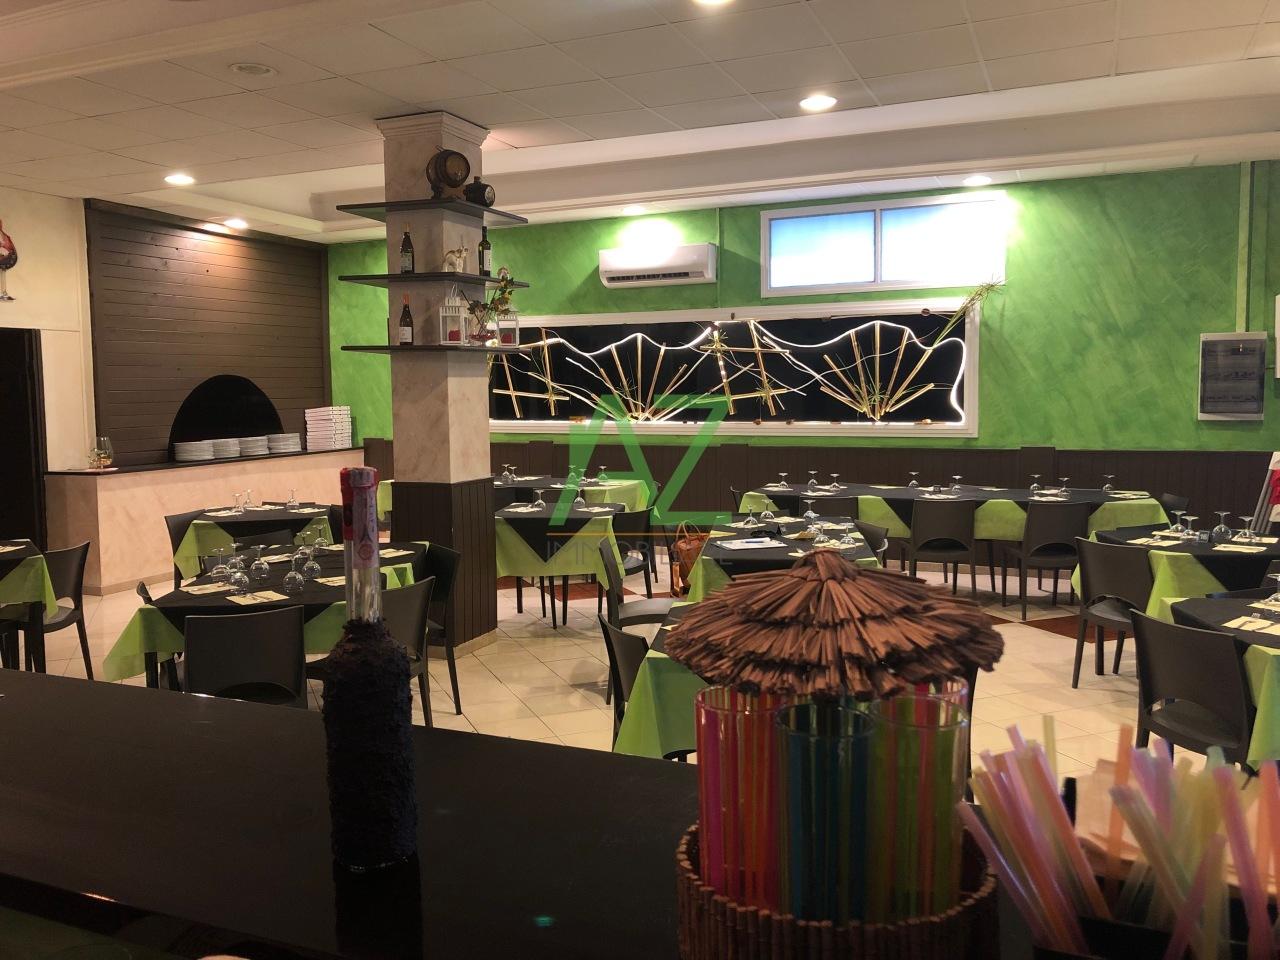 Ristorante Pizzeria a Centro, Motta Sant'Anastasia Rif. 11117891